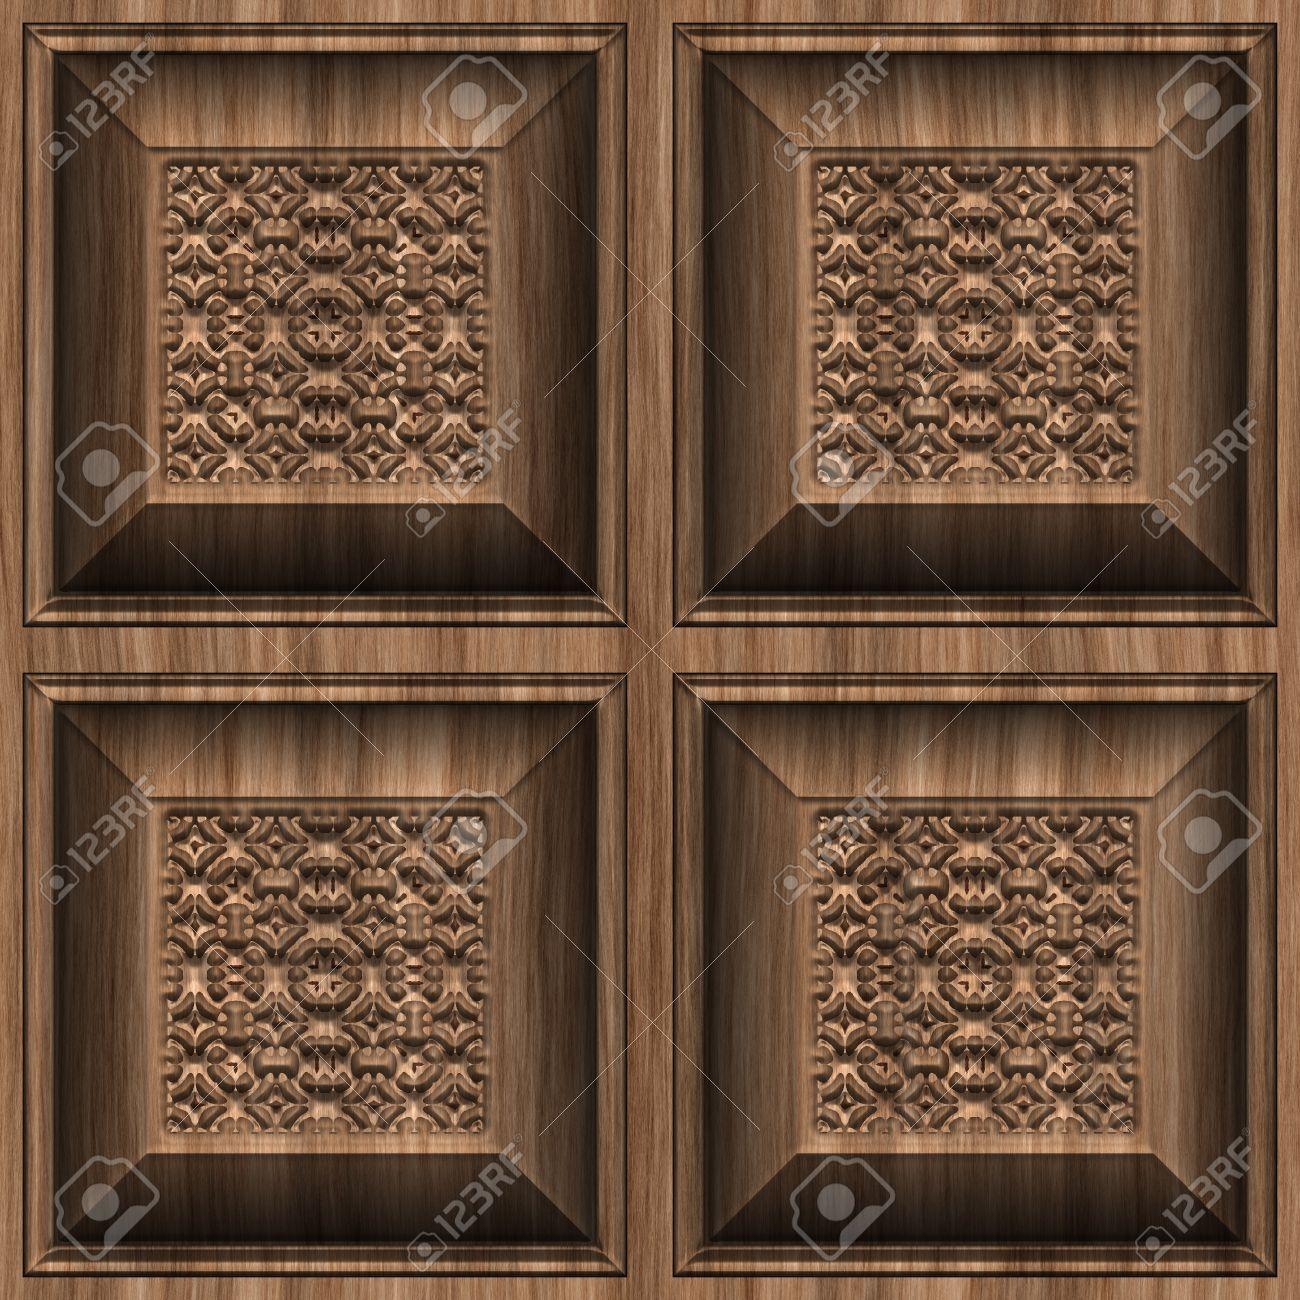 Interior wall texture seamless carvedwoodseamlesstexturetilestockphotog